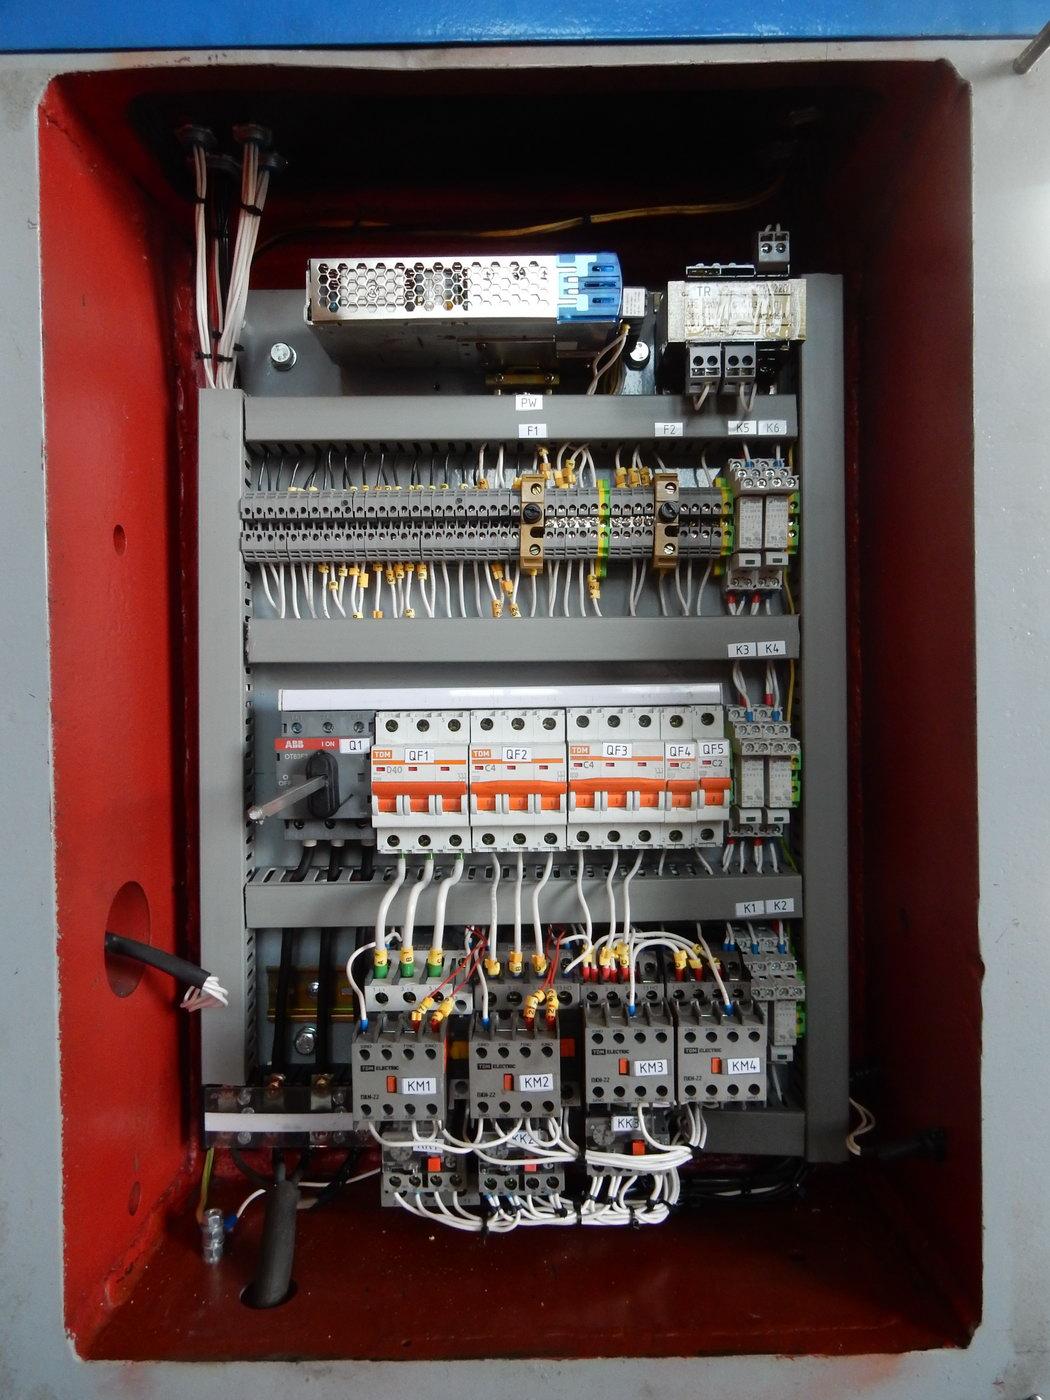 Knuckle joint press KB8336 400 ton / Modernized